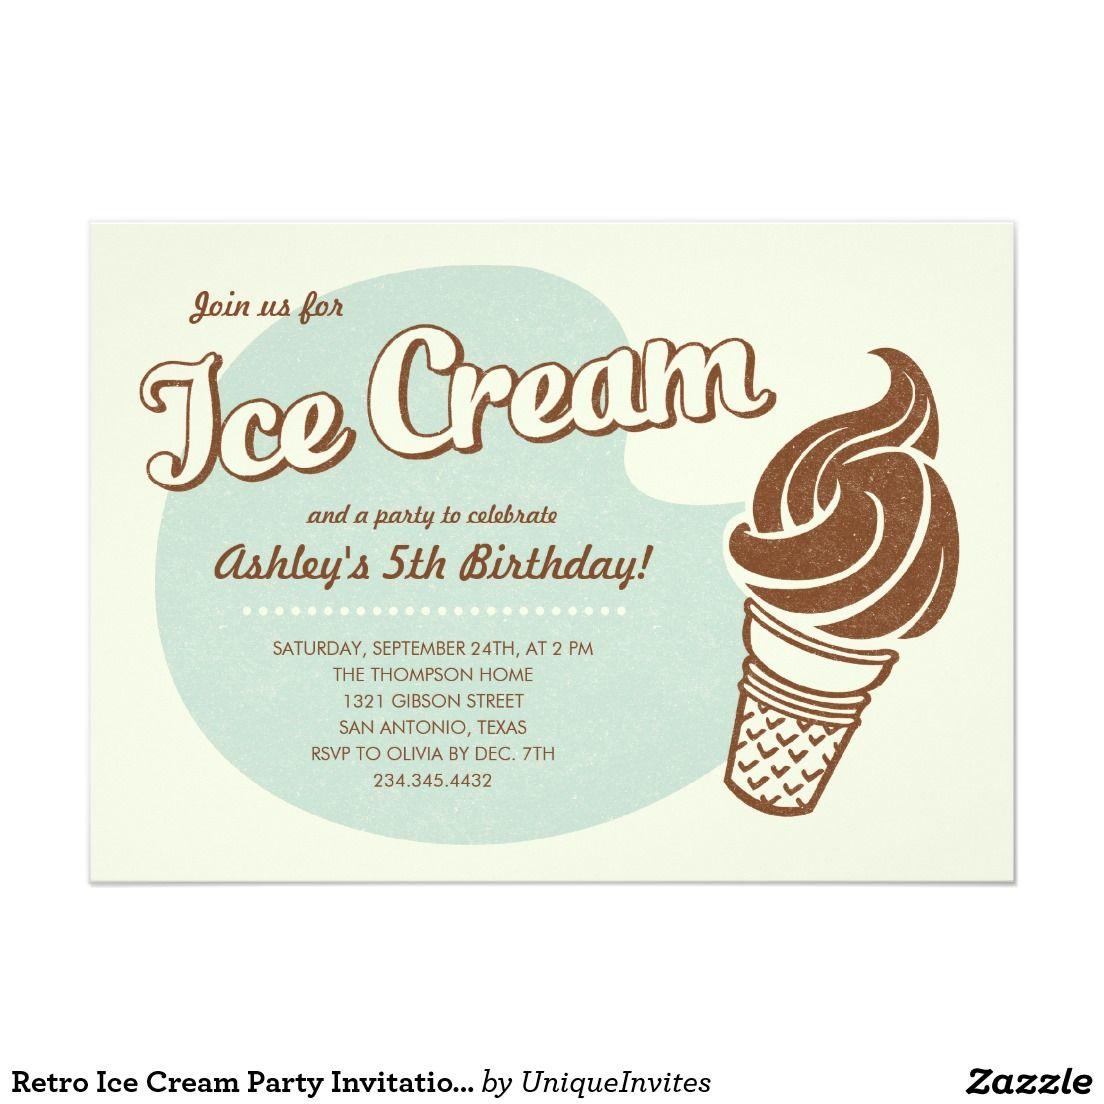 Retro Ice Cream Party Invitations | Party invitations